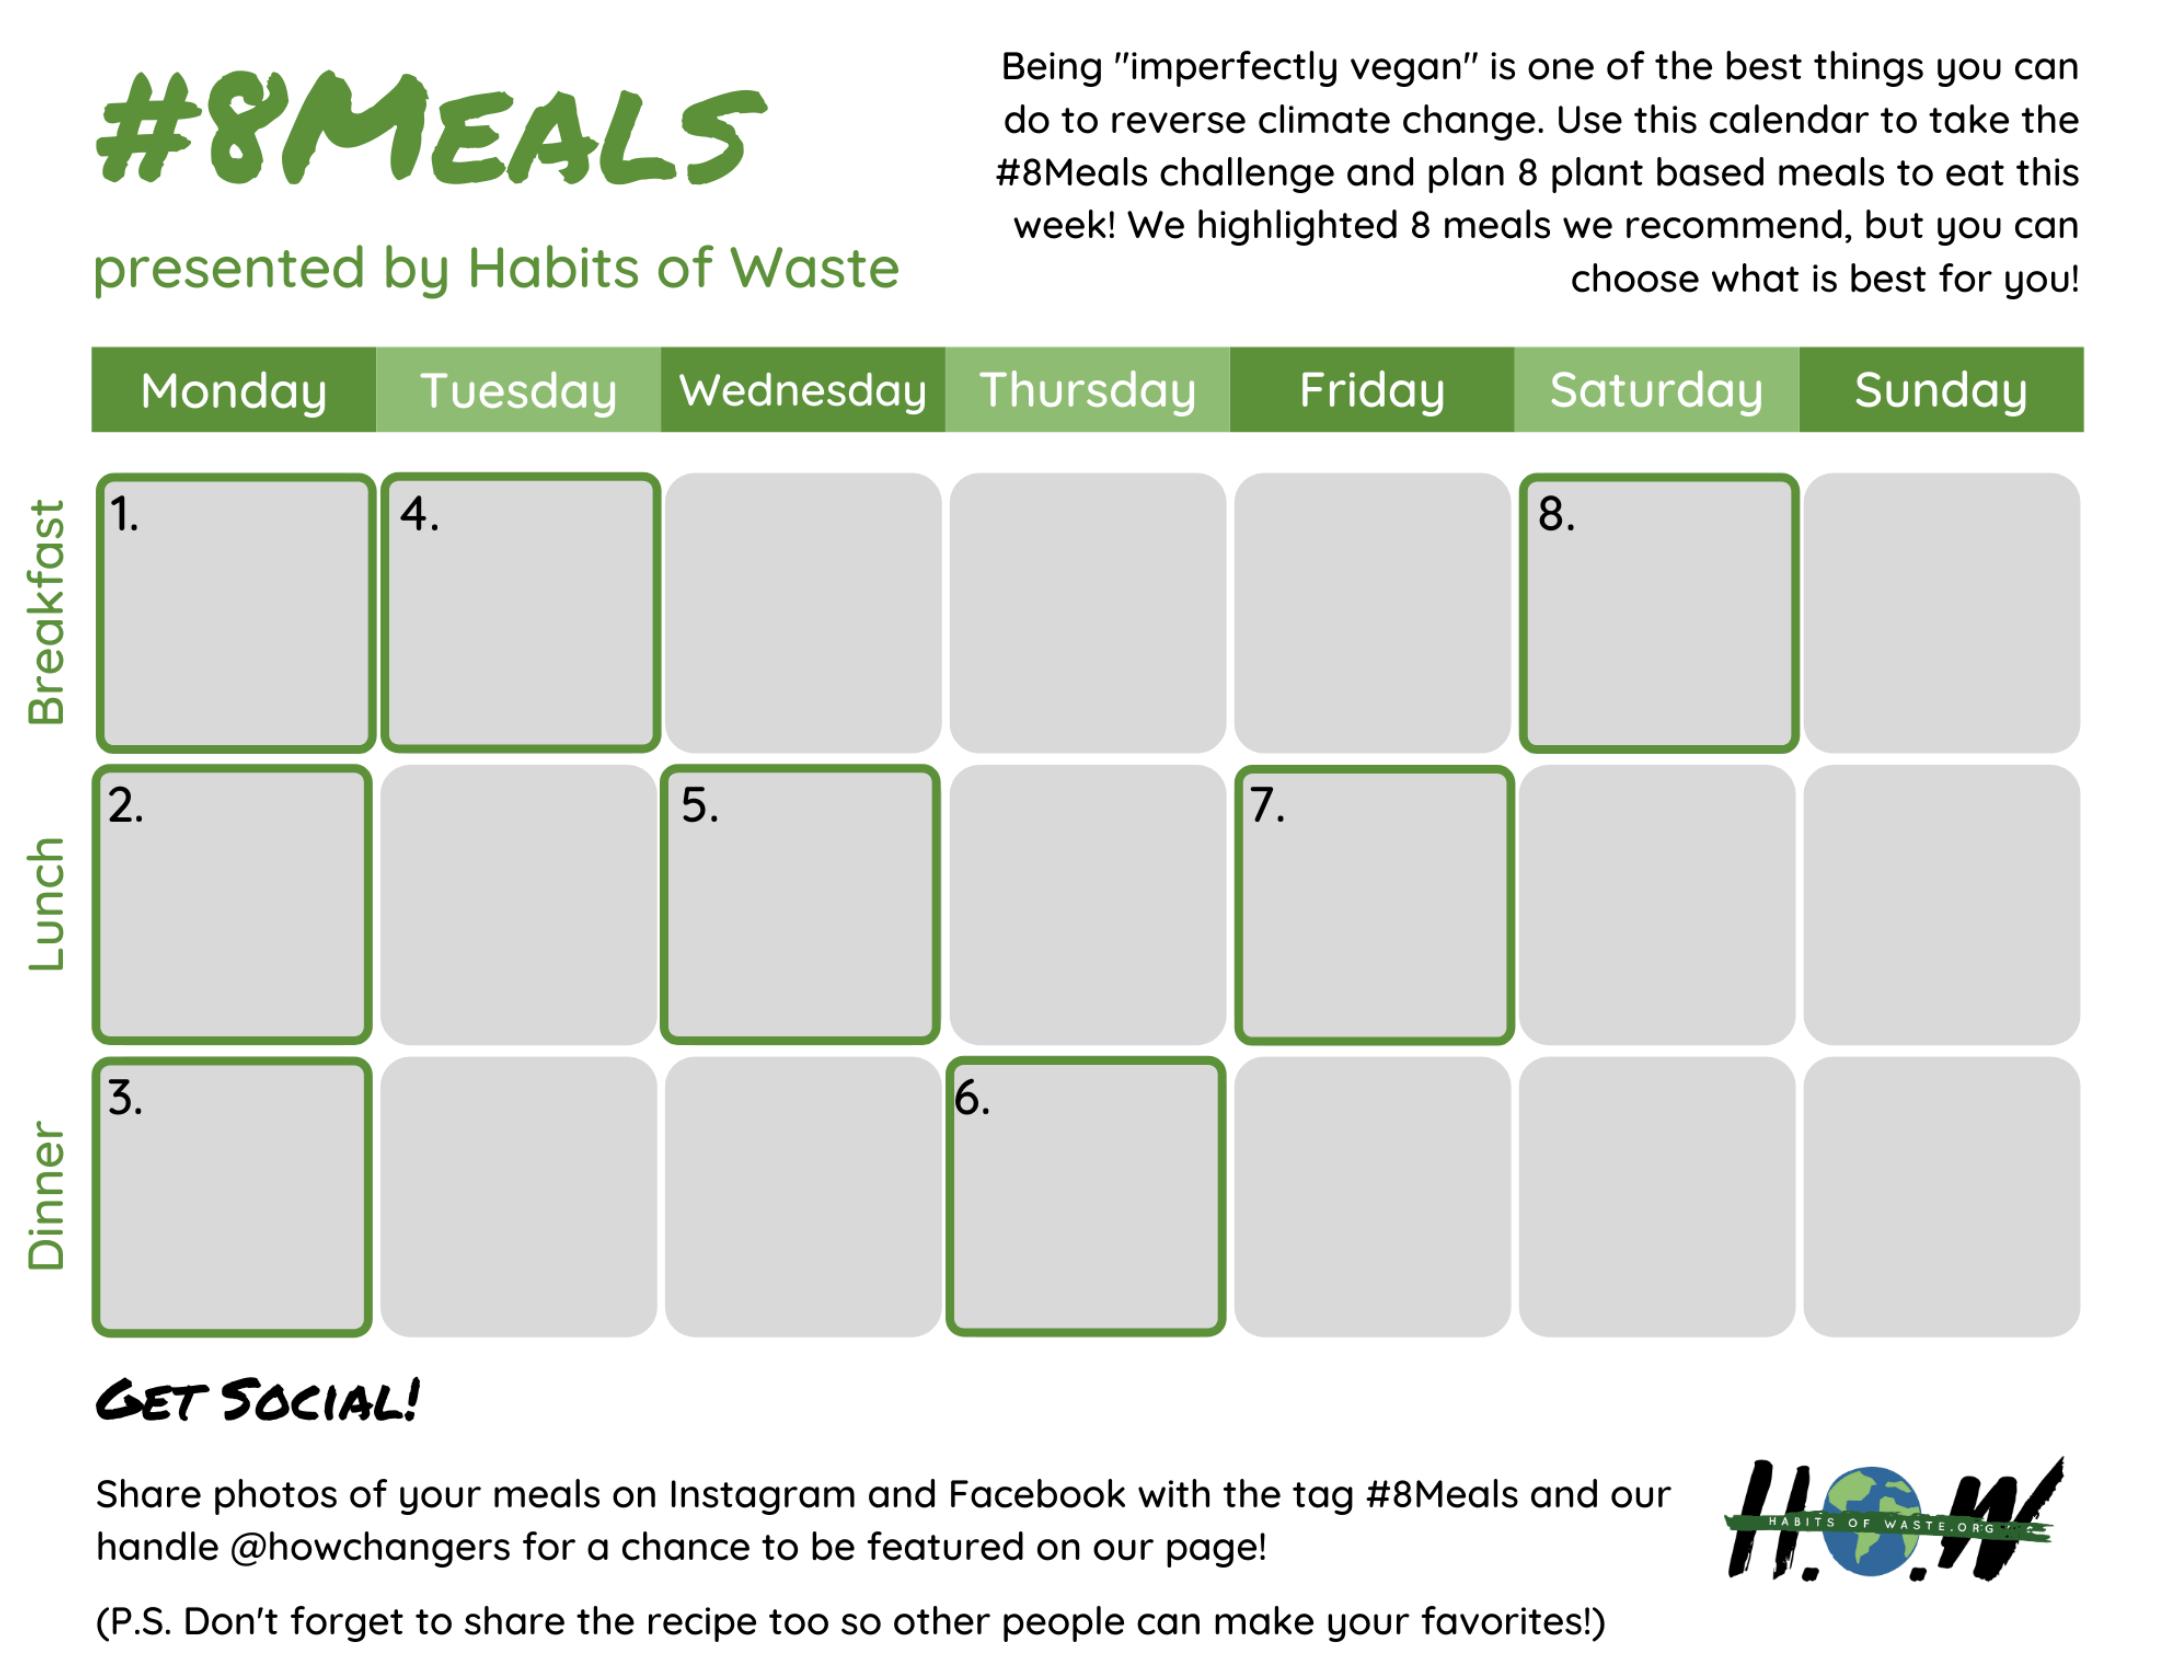 Here is a sample #8meals weekly calendar